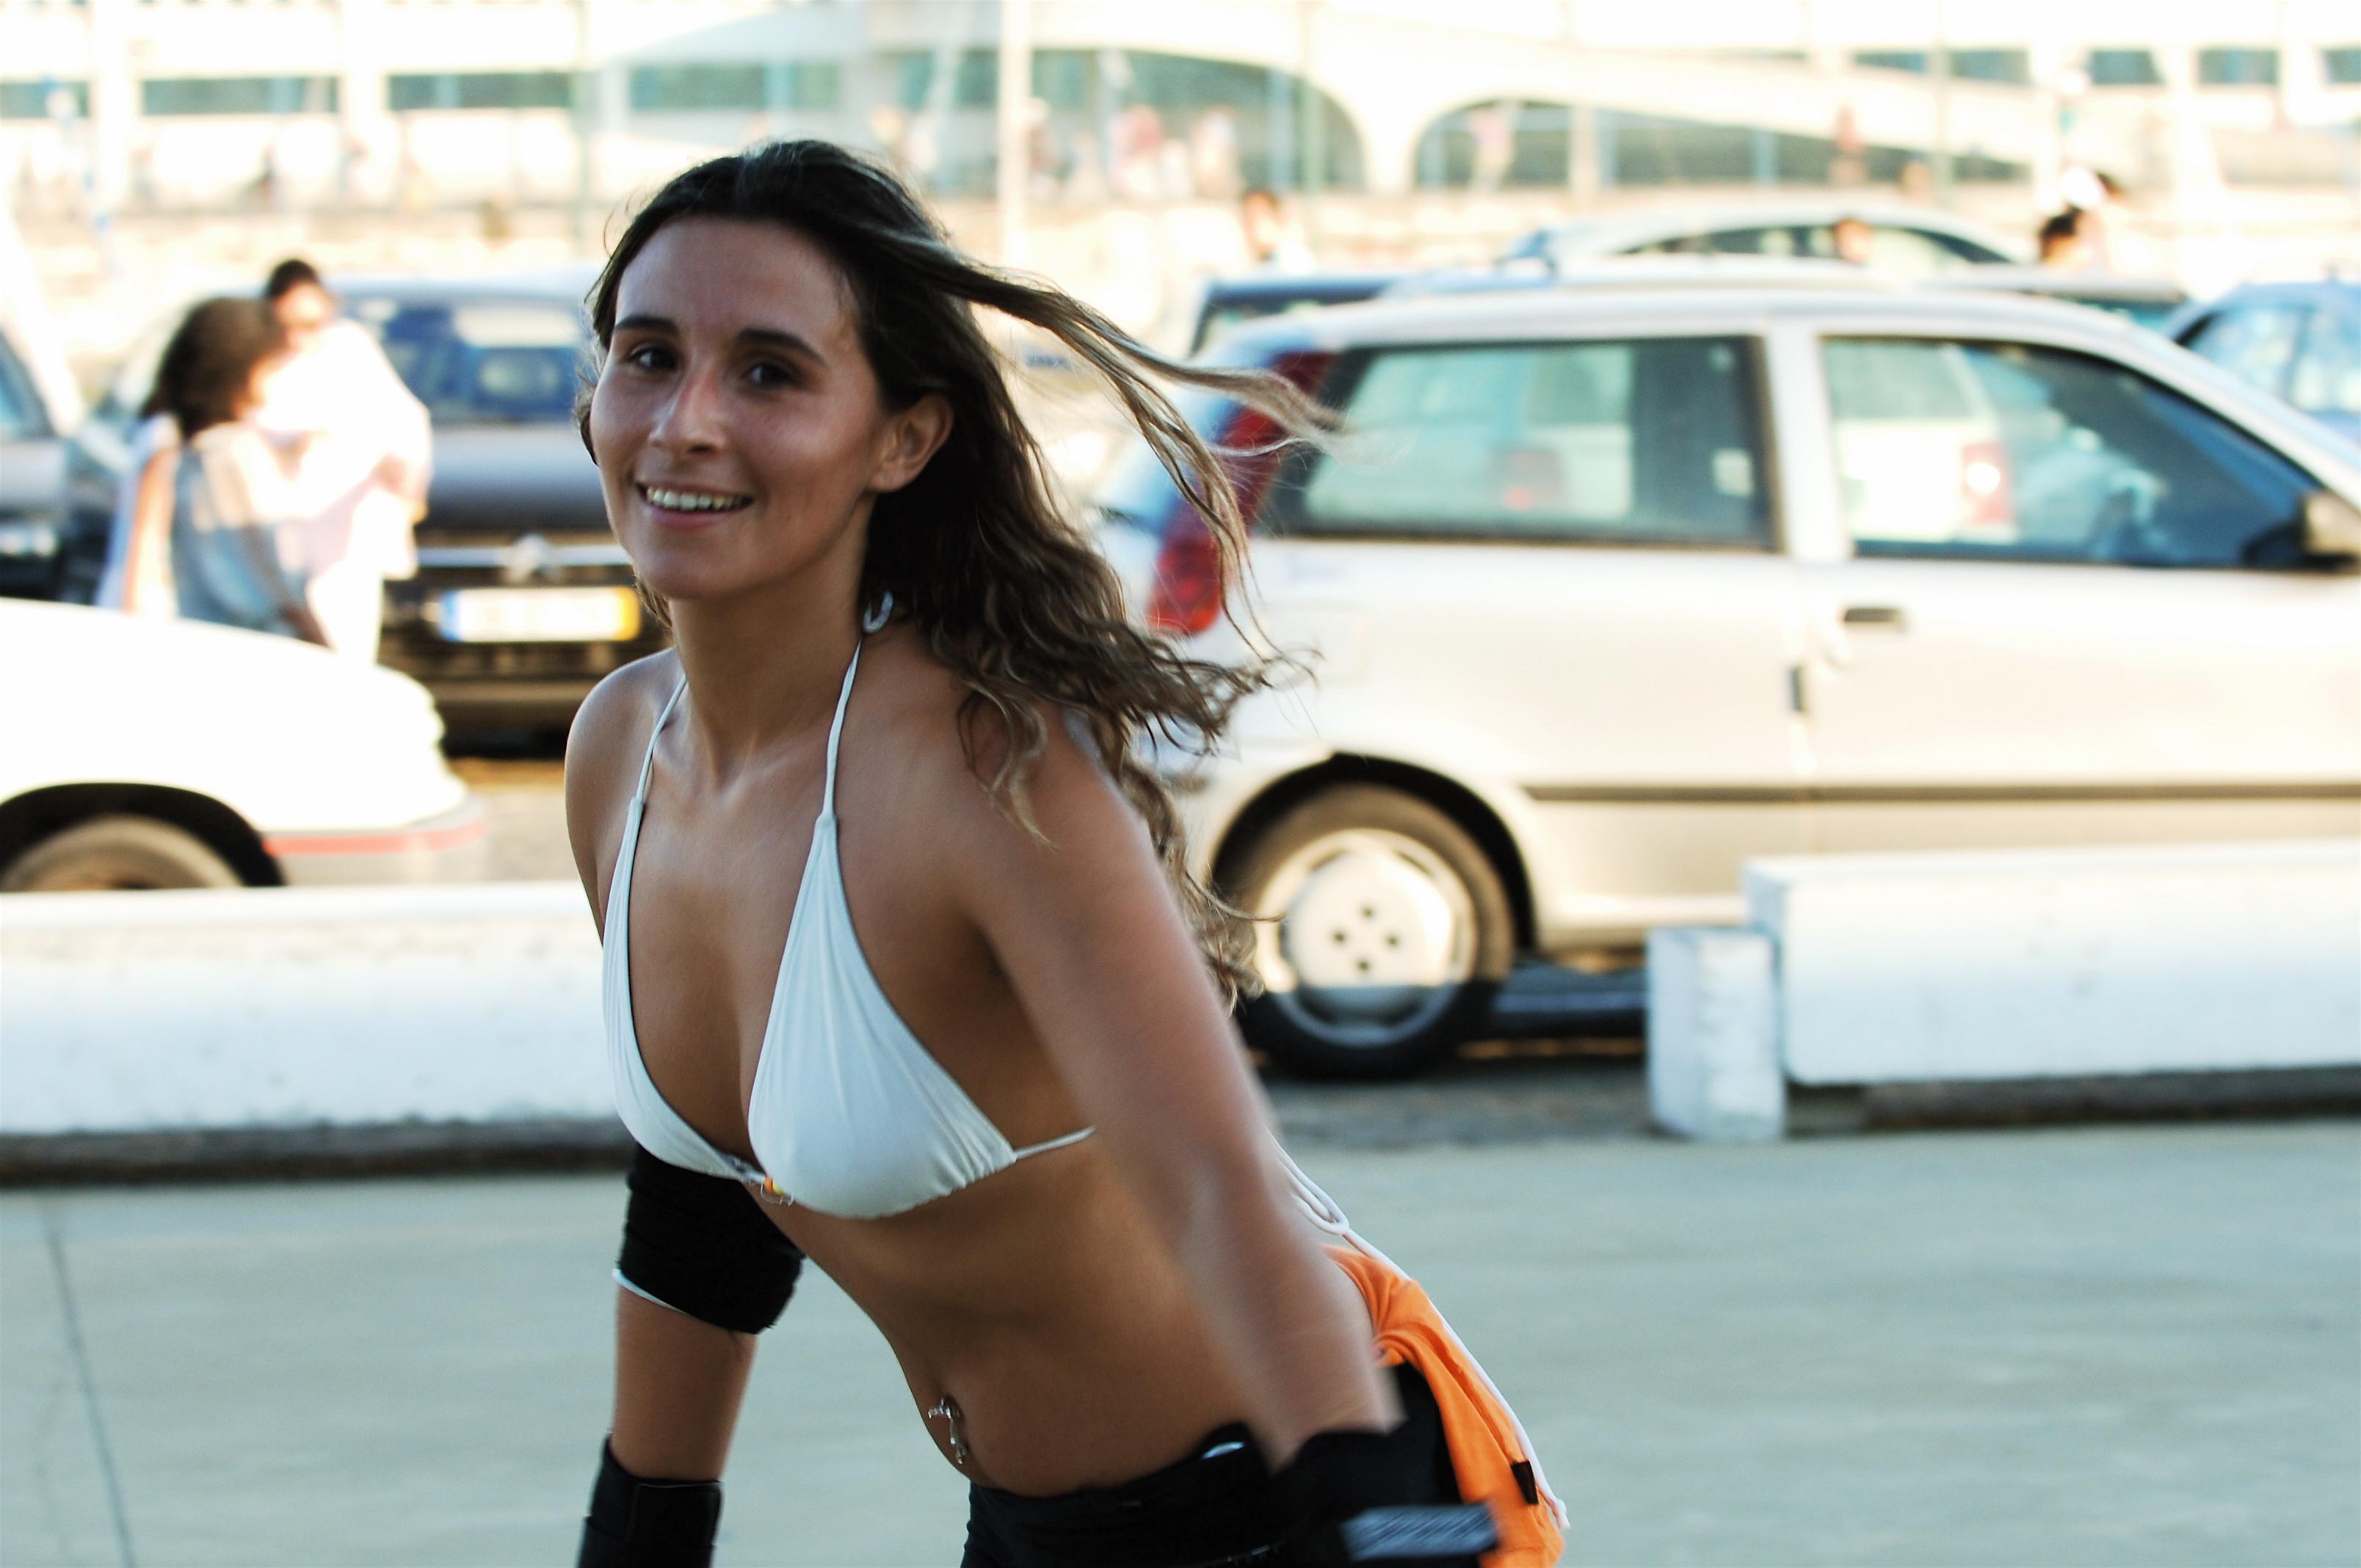 model vehicle bra bikini Lisbon clothing Portugal skate girl beauty woman photo shoot caisdoespanhol